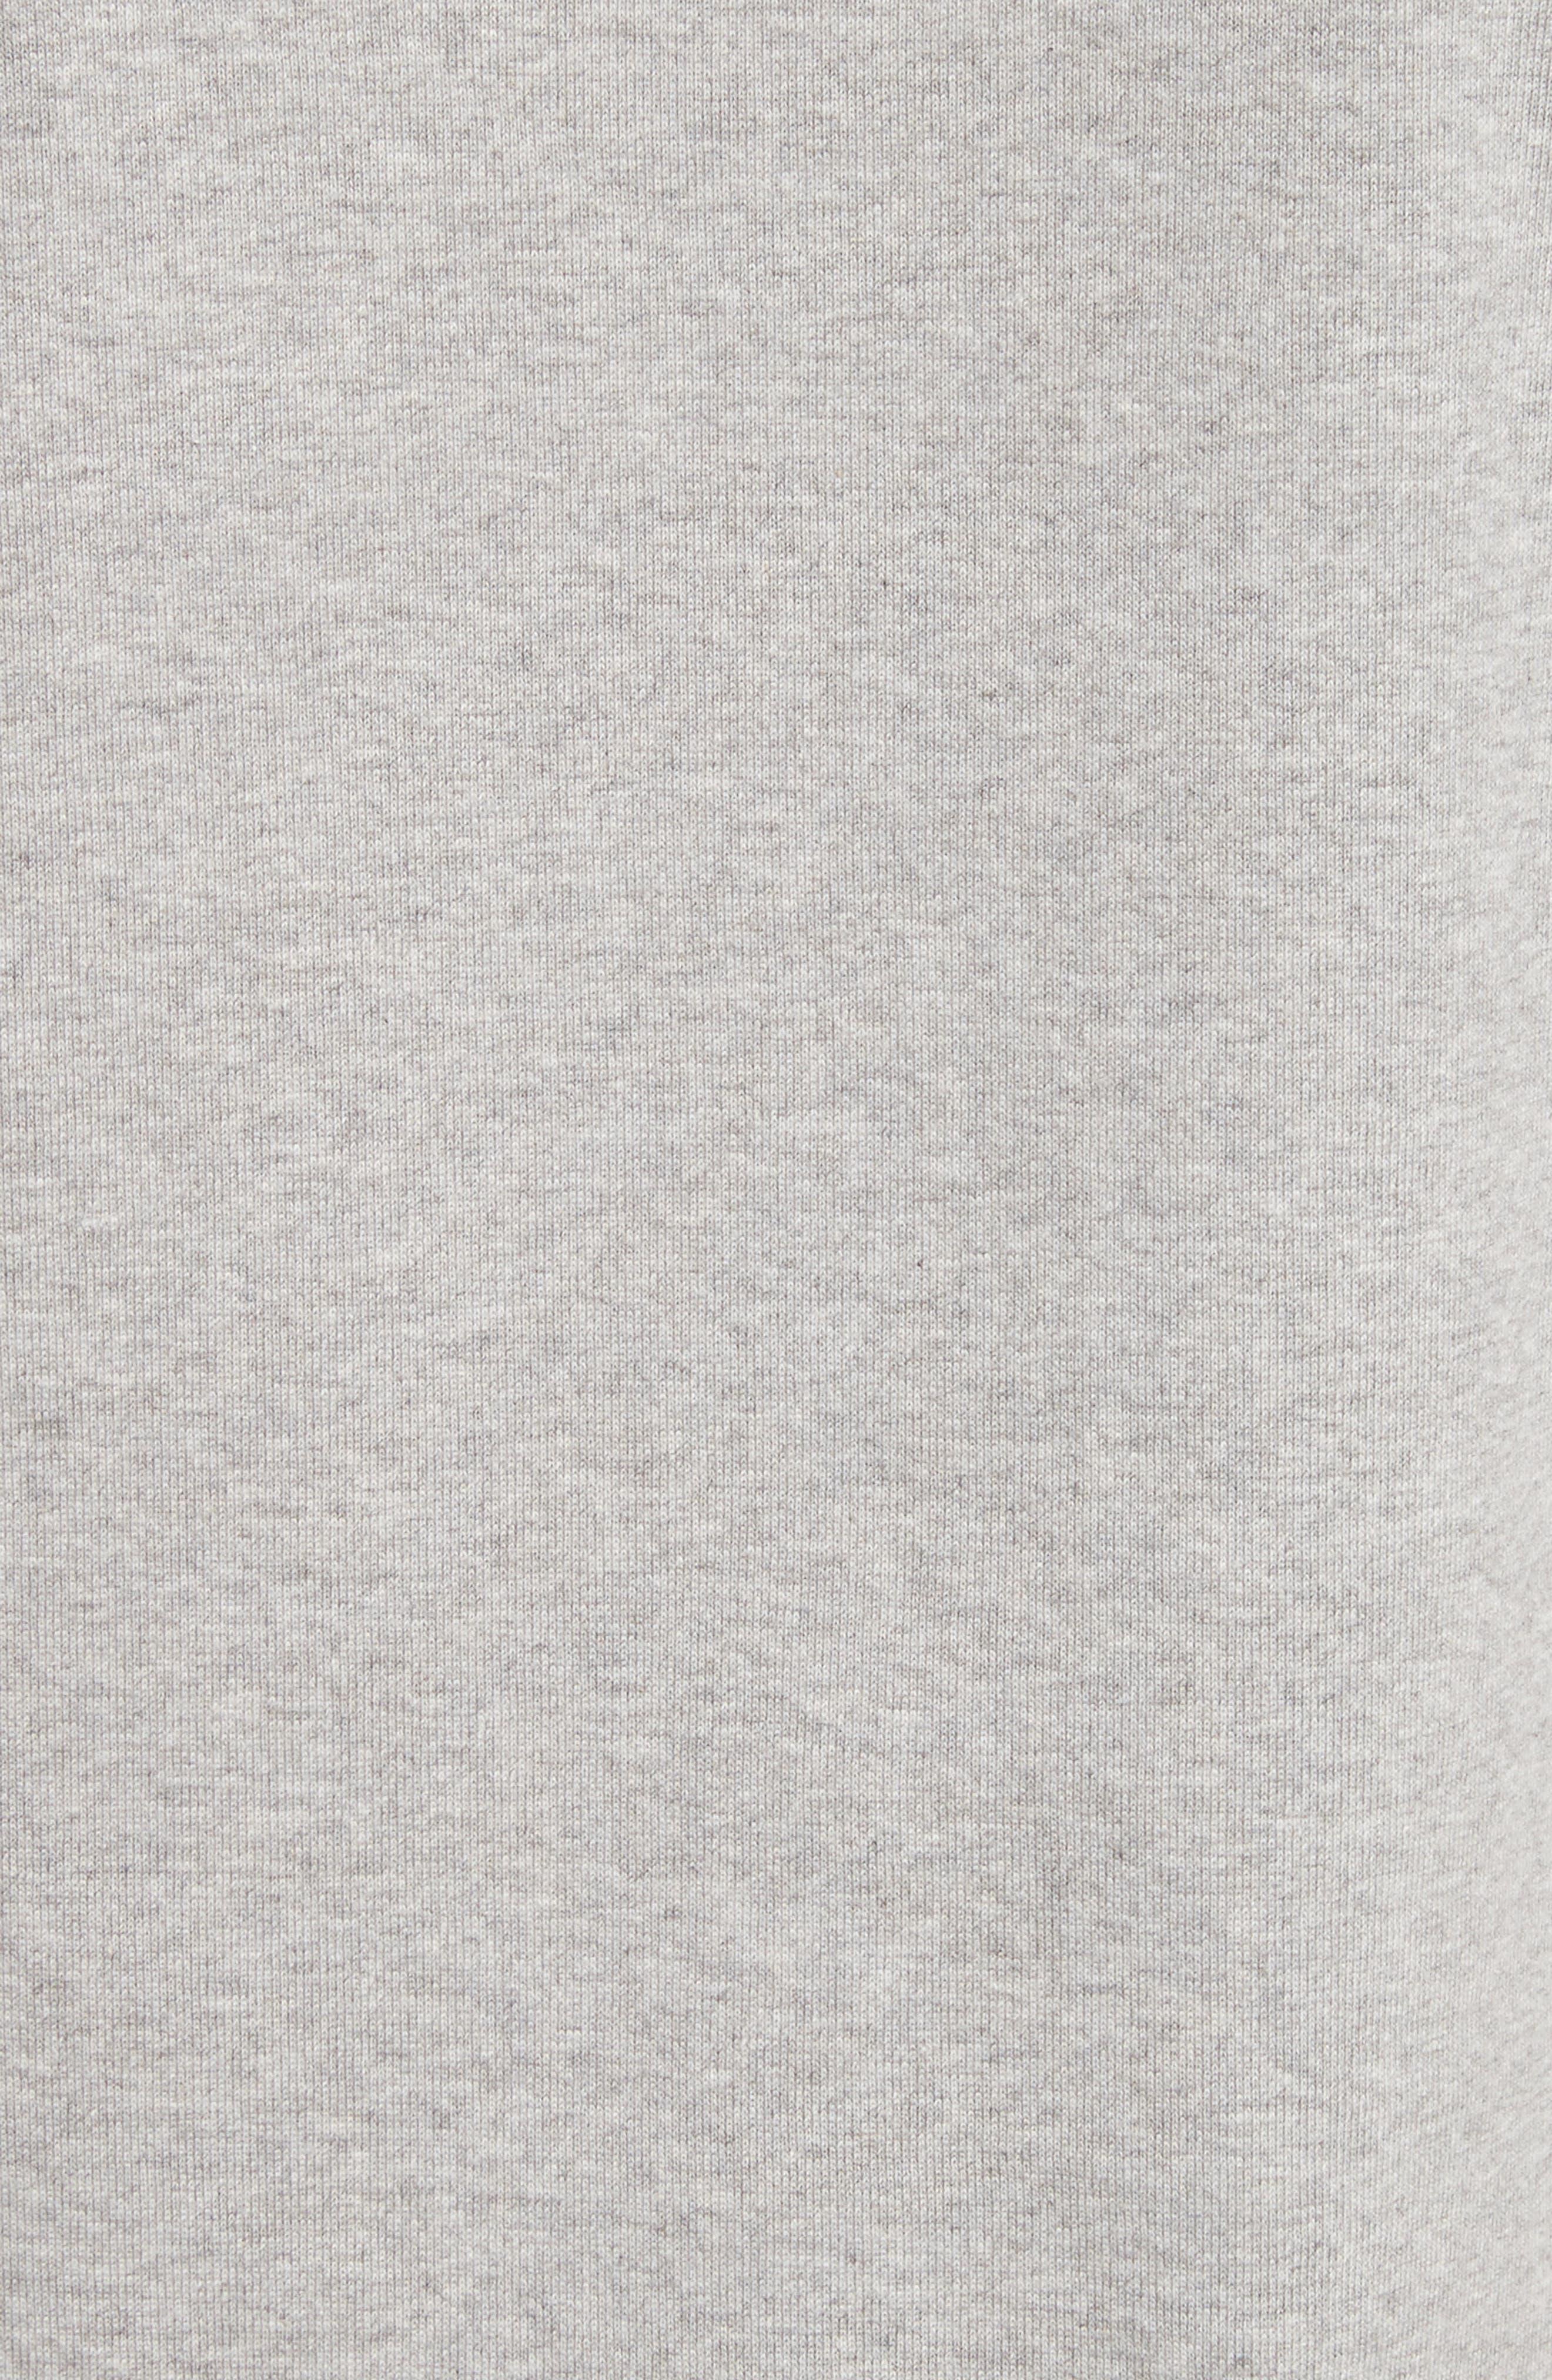 James T-Shirt,                             Alternate thumbnail 5, color,                             021